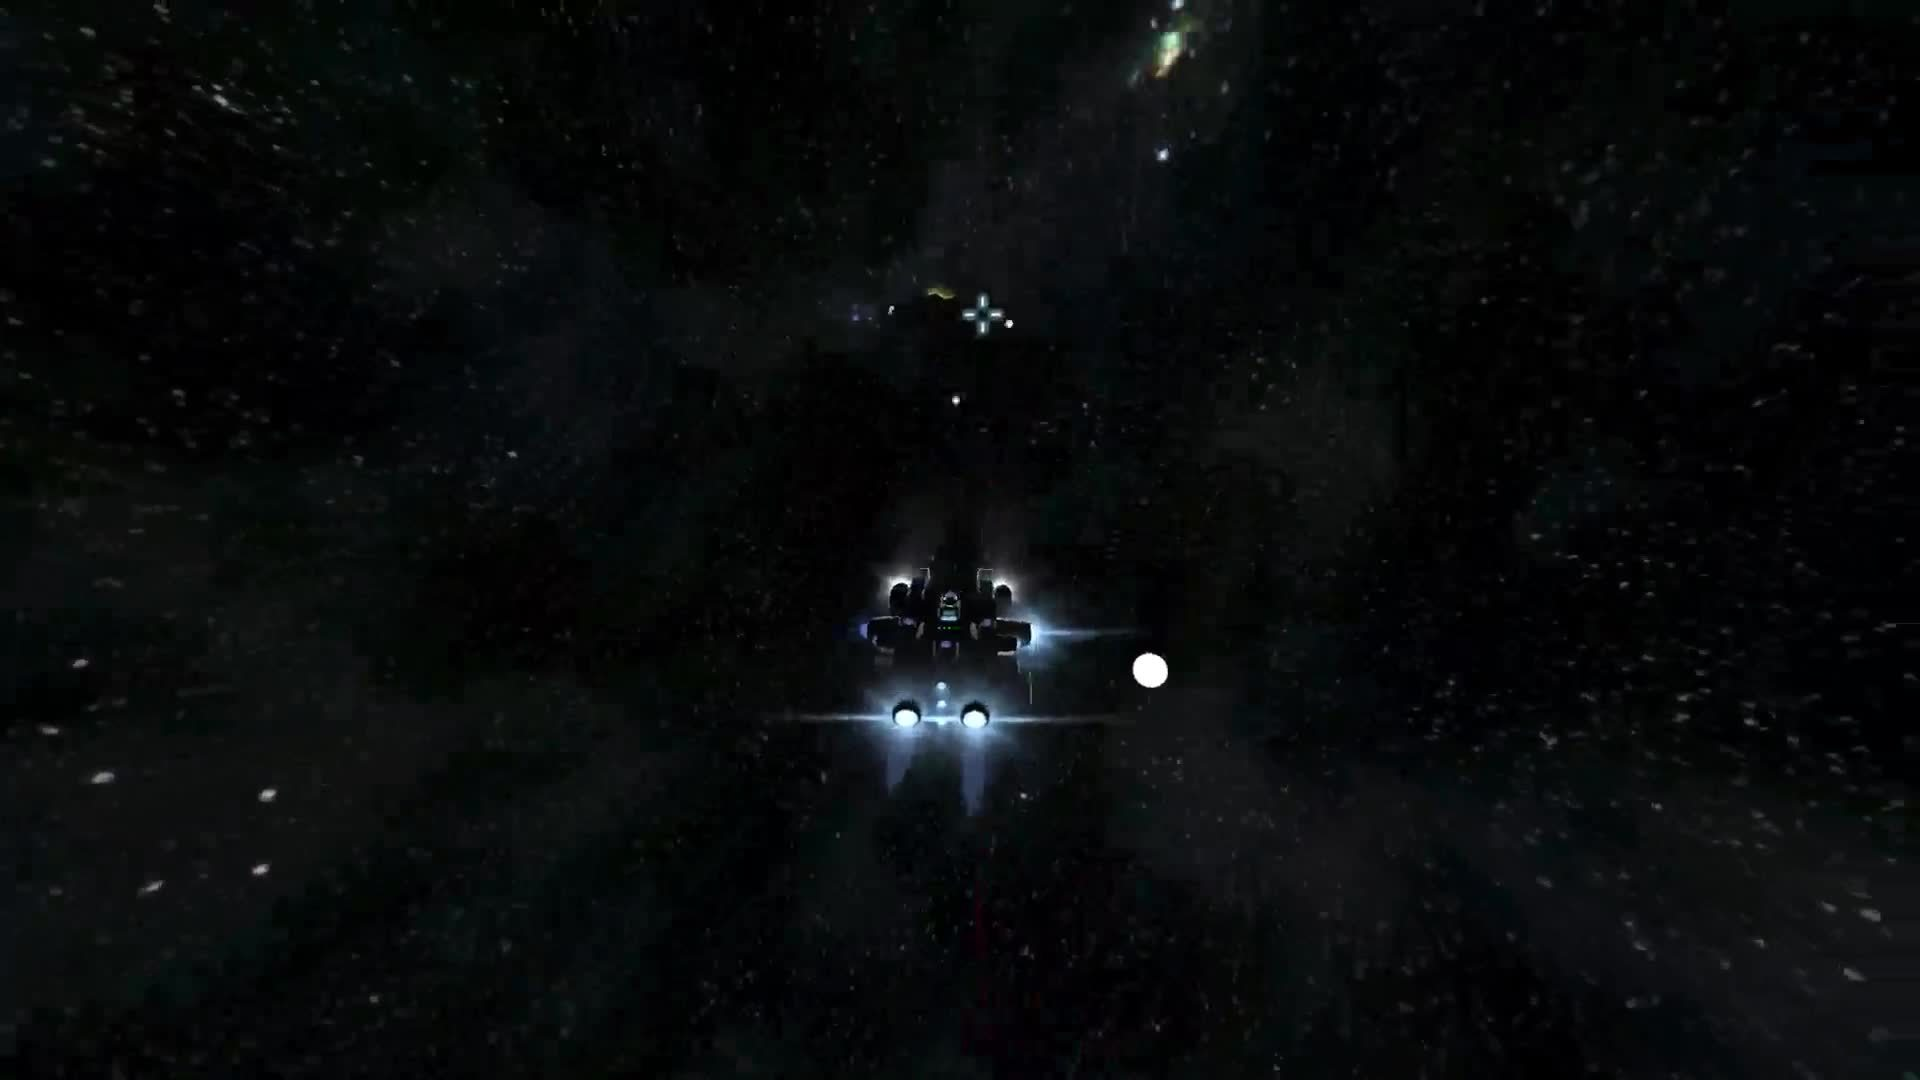 spaceengineers, Whip's Weapon Sequencer Script [Workshop] (reddit) GIFs